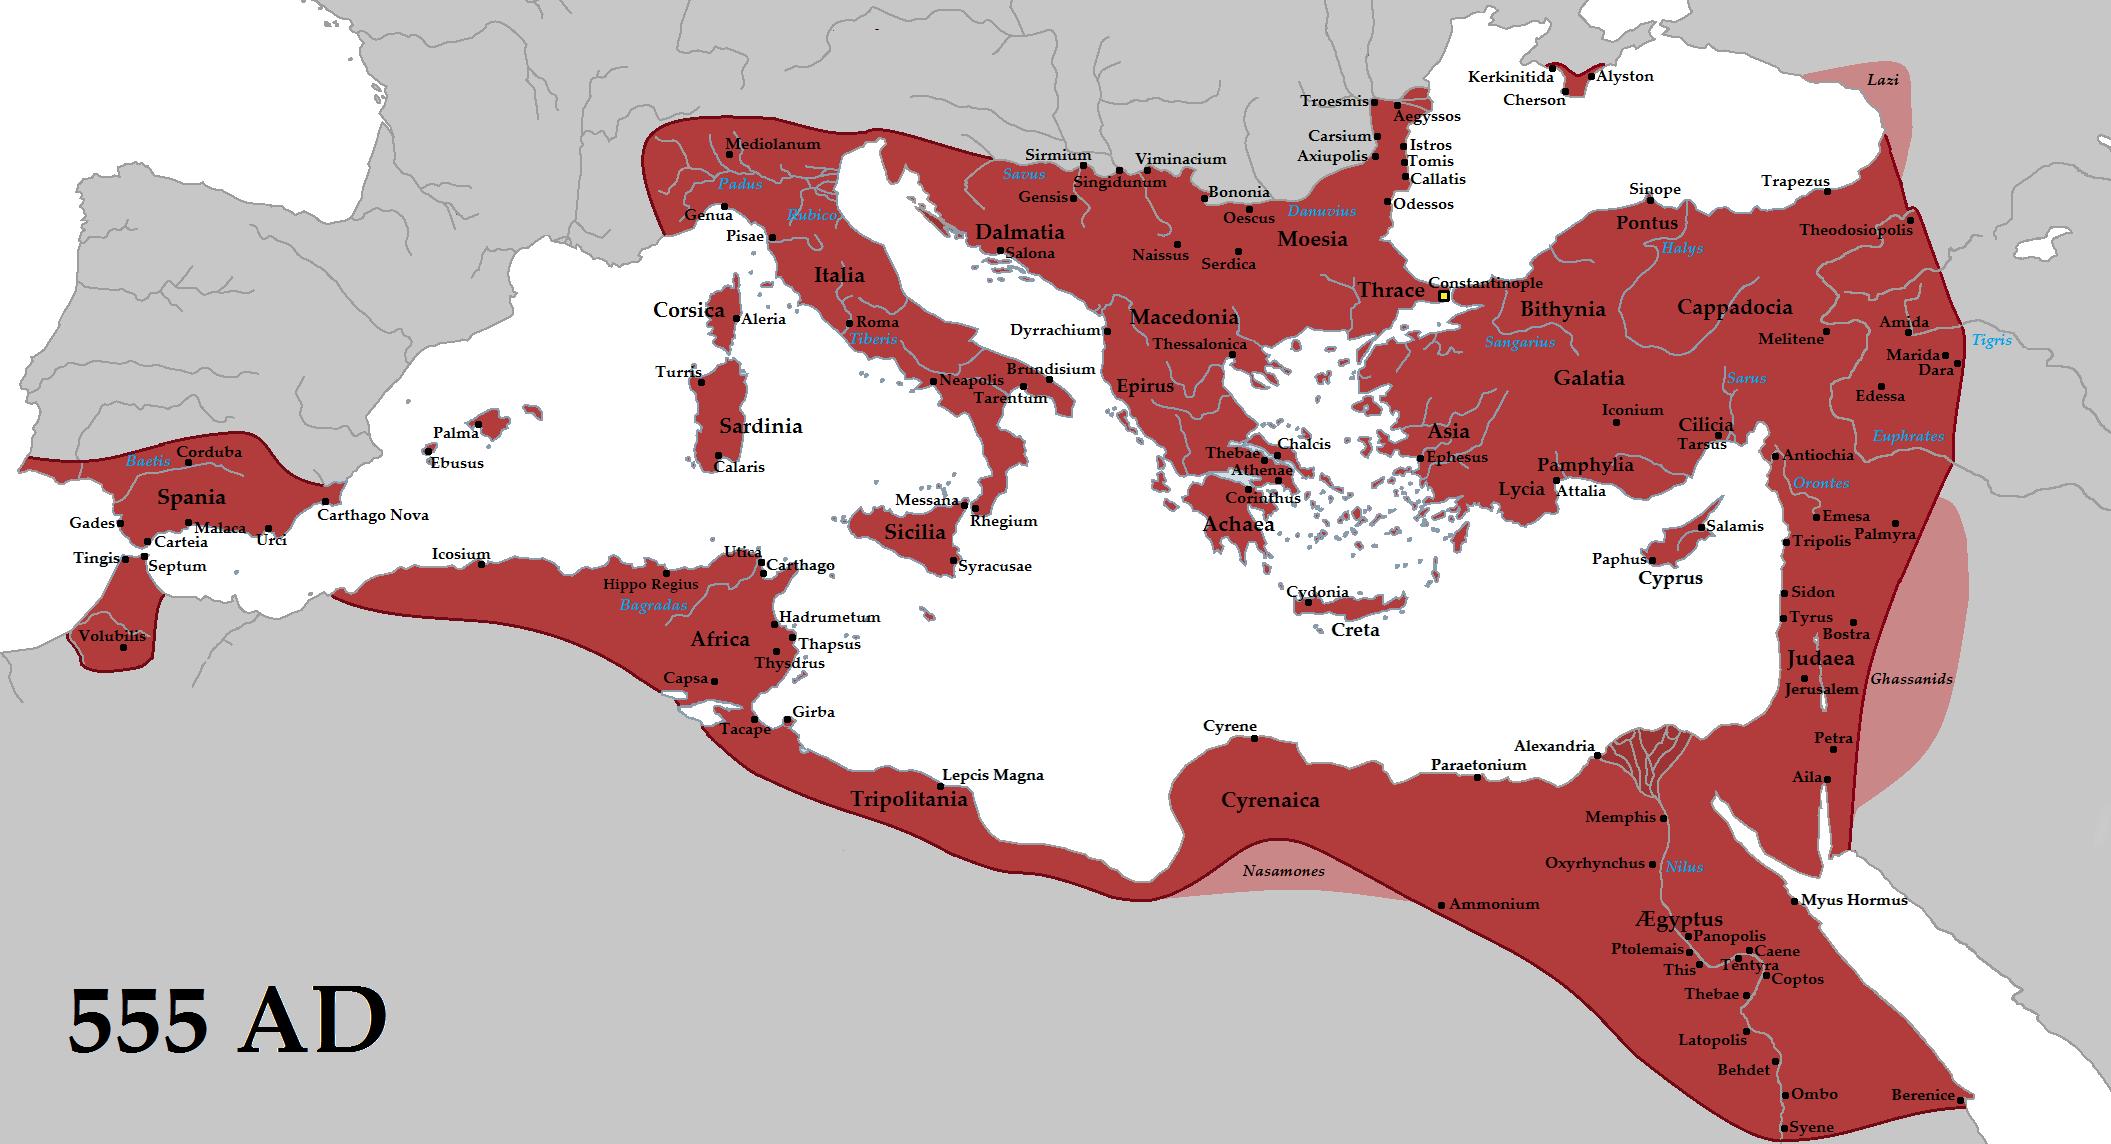 Justinian555AD